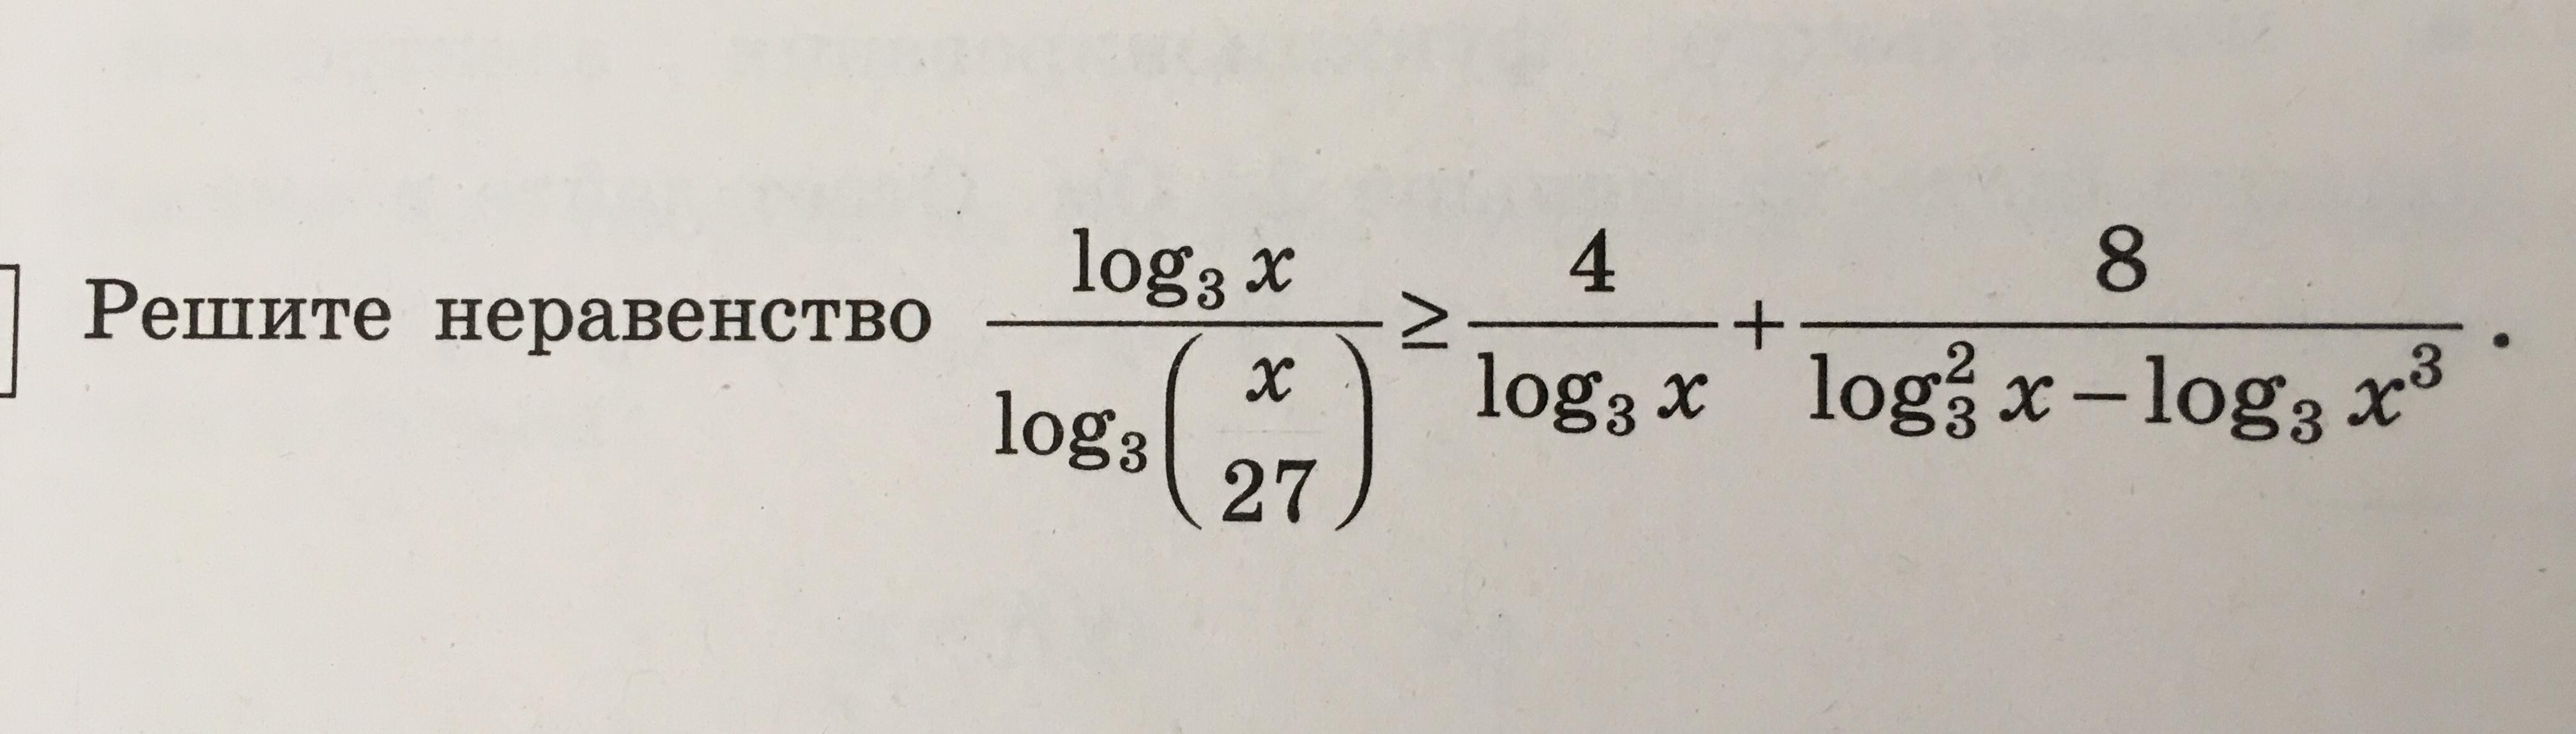 Пусть t=log3 x. Как представить log3 (x/27) в виде t? СРООЧНО Загрузить jpeg